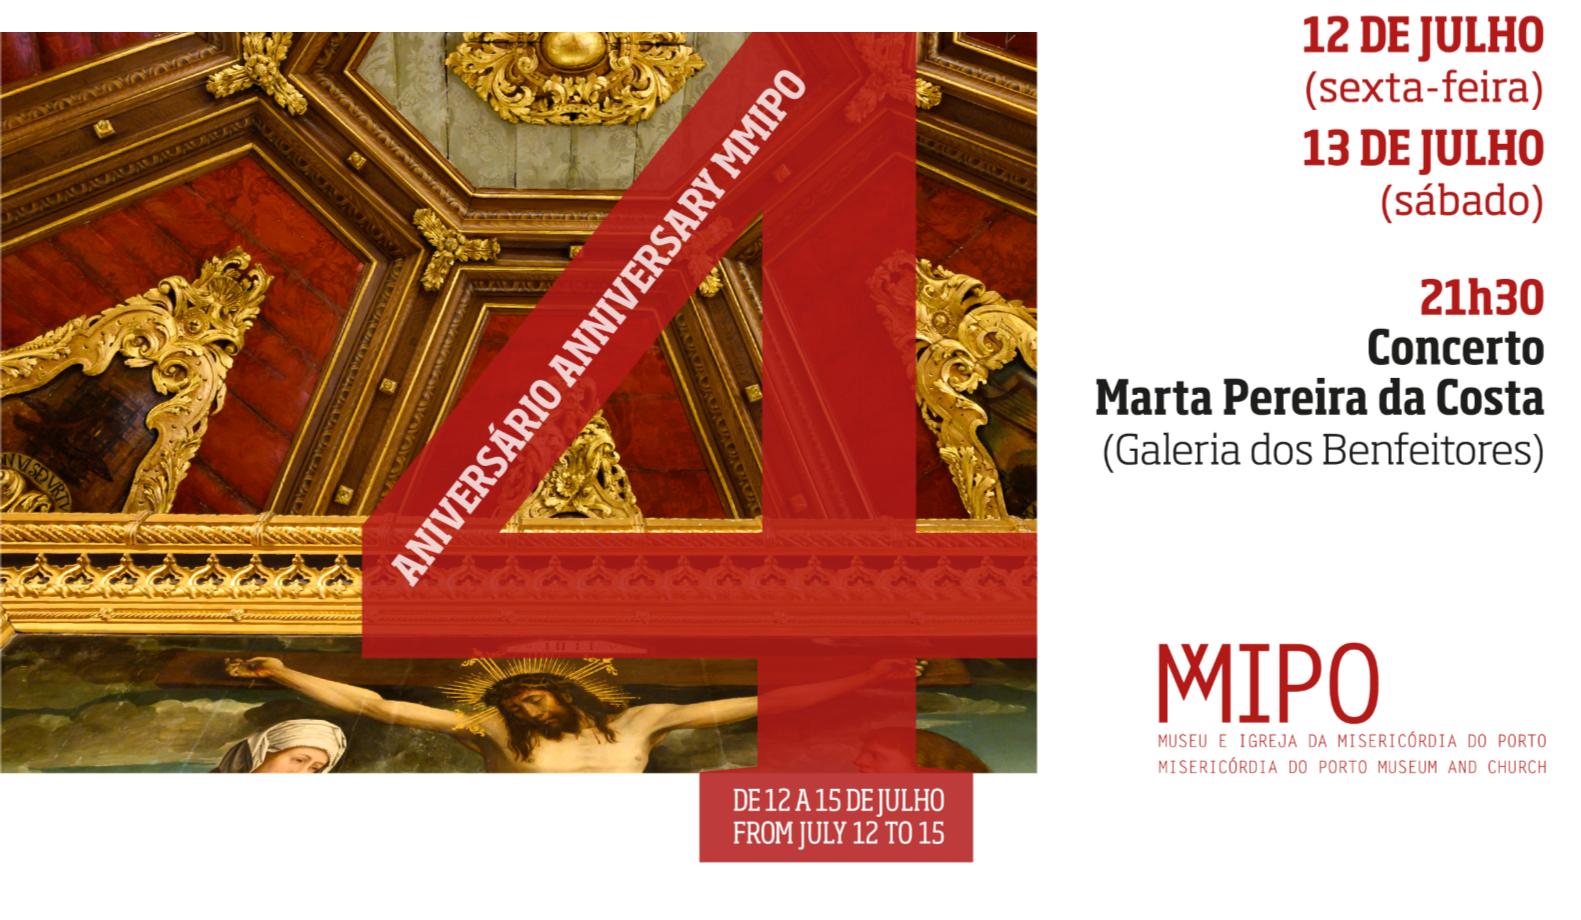 http://www.mmipo.pt/assets/misc/slideshow/2019/Concerto%20Sexta%20e%20sabado.png